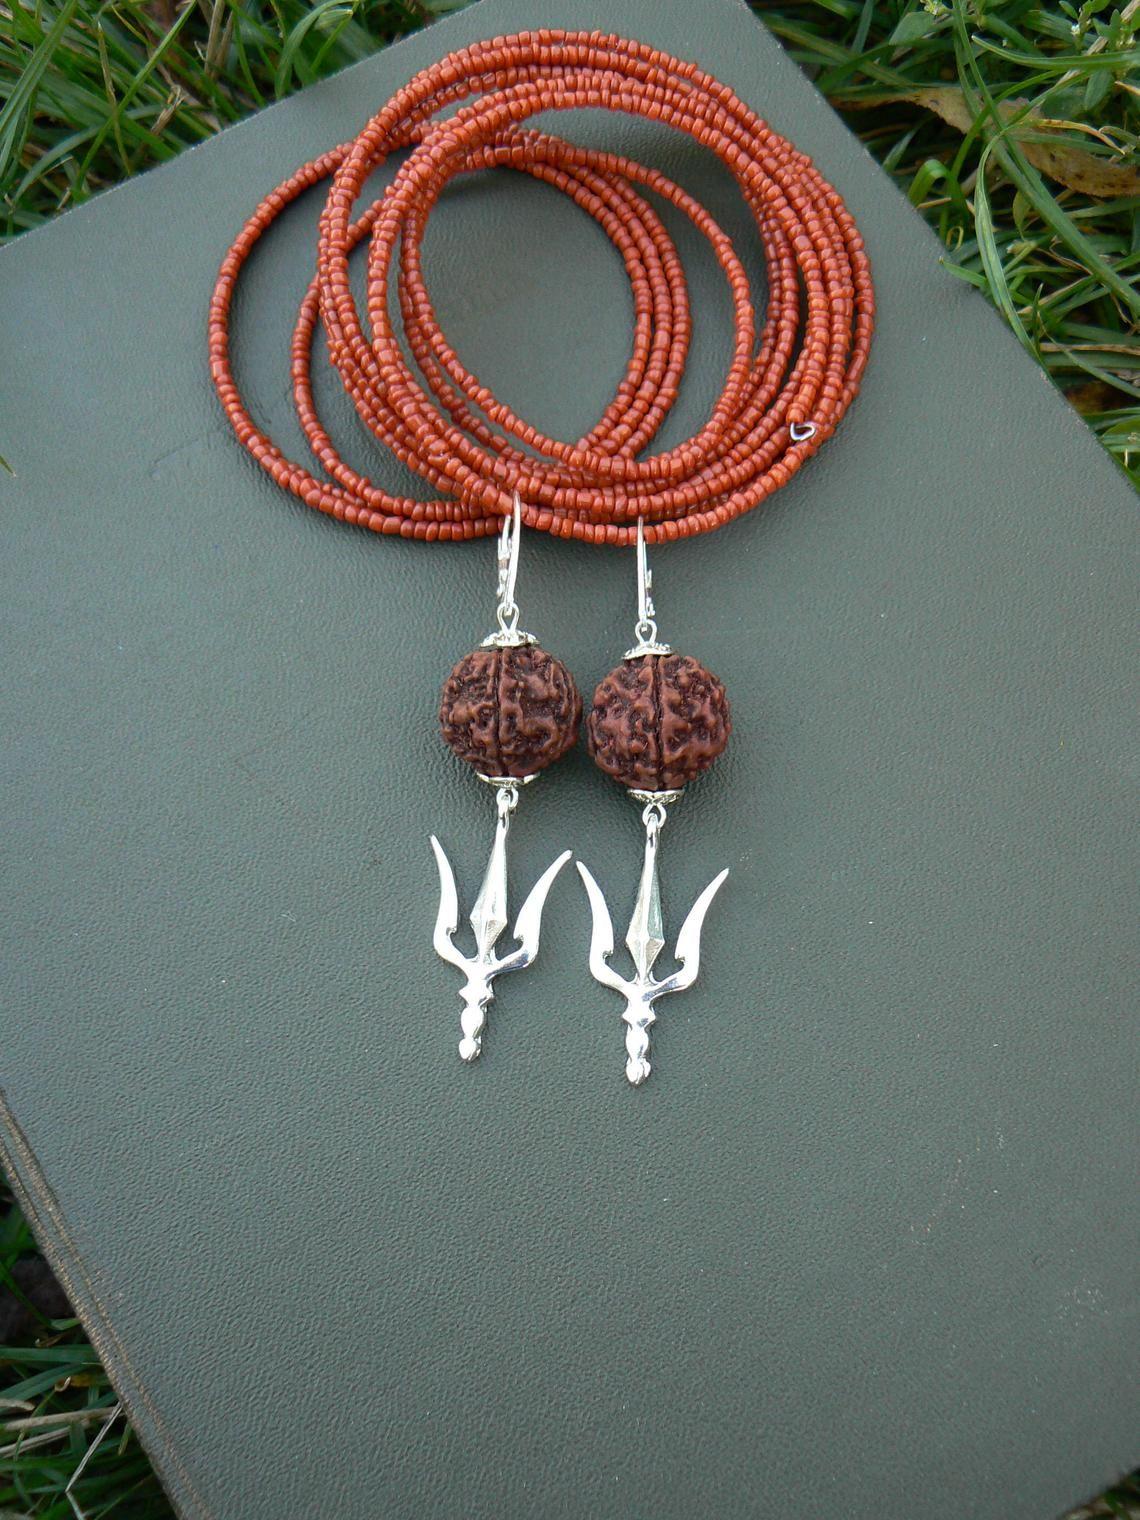 d4800a813 Shiva Trishul Rudraksha earrings, Hindu symbol, Kundalini yoga ...